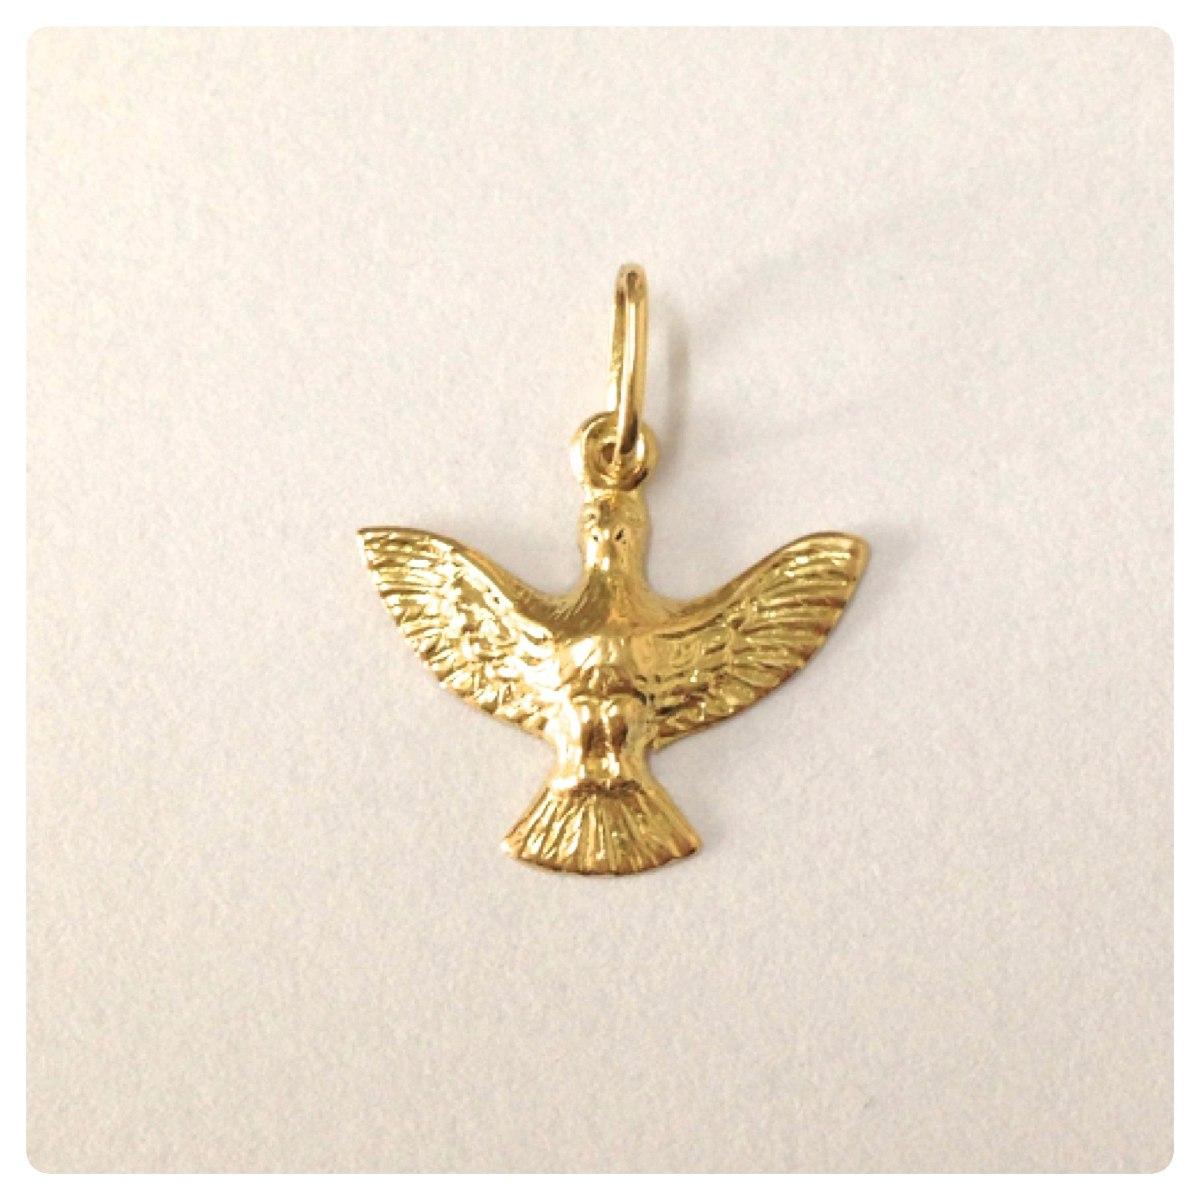 49808a142bf1d pingente divino espirito santo ouro 18k joia c  certificado. Carregando  zoom.